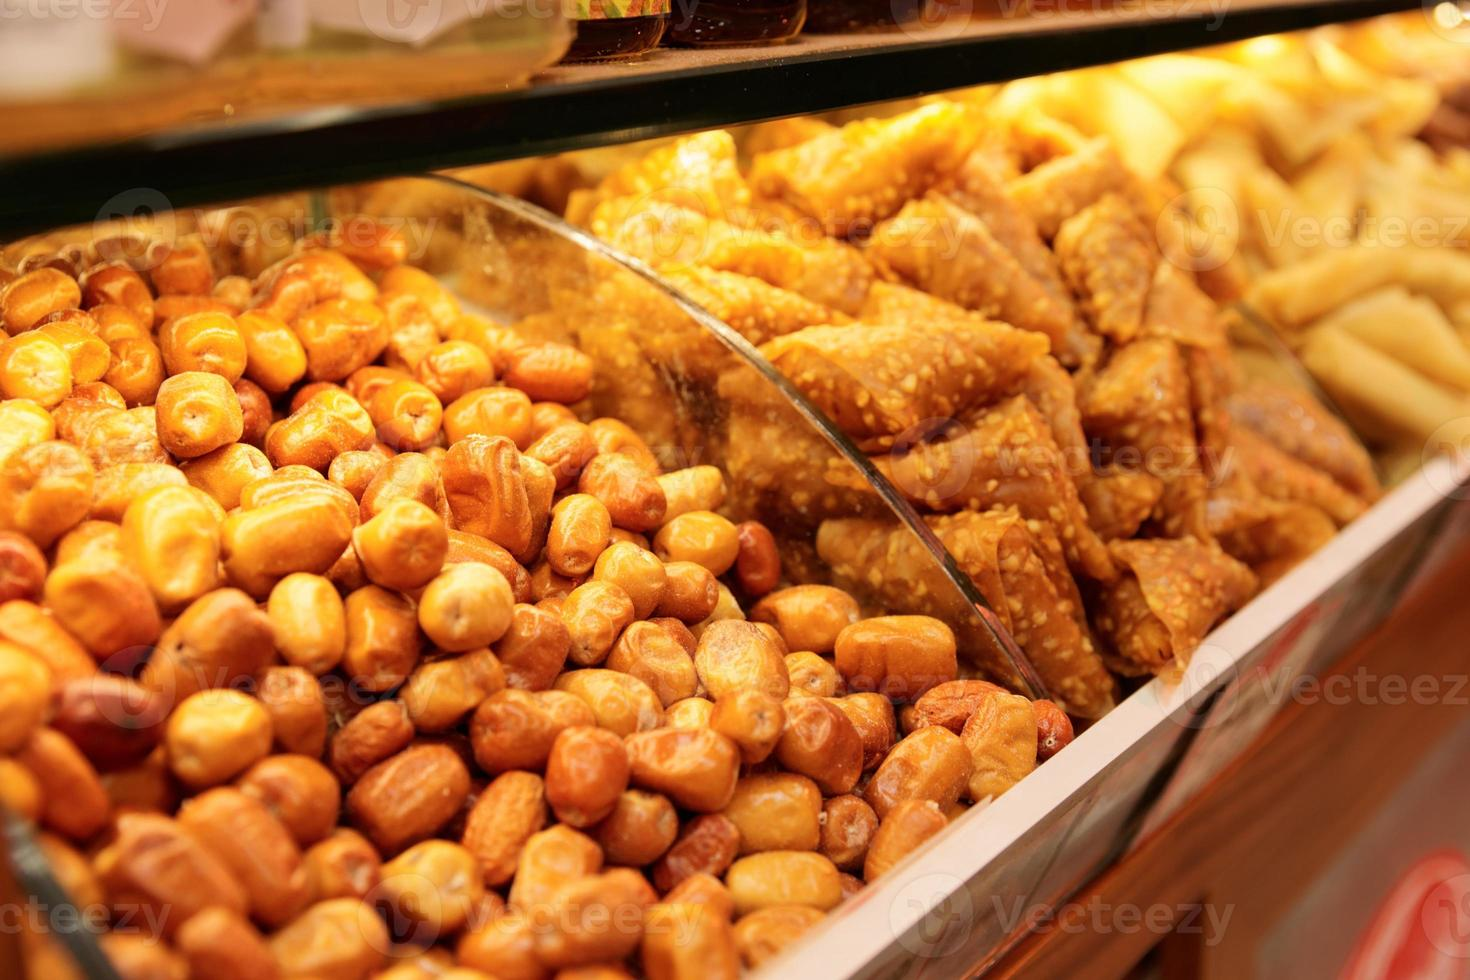 Nuts and baklava on market shelf photo